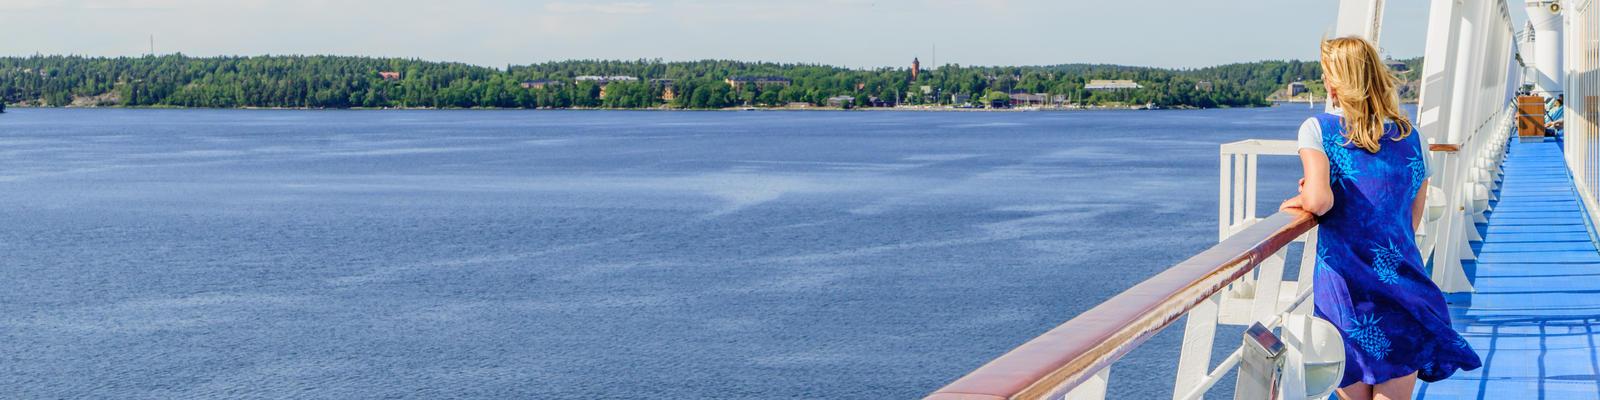 Enjoying peace and silence on a cruise ship (Photo: Tony Moran/Shutterstock)